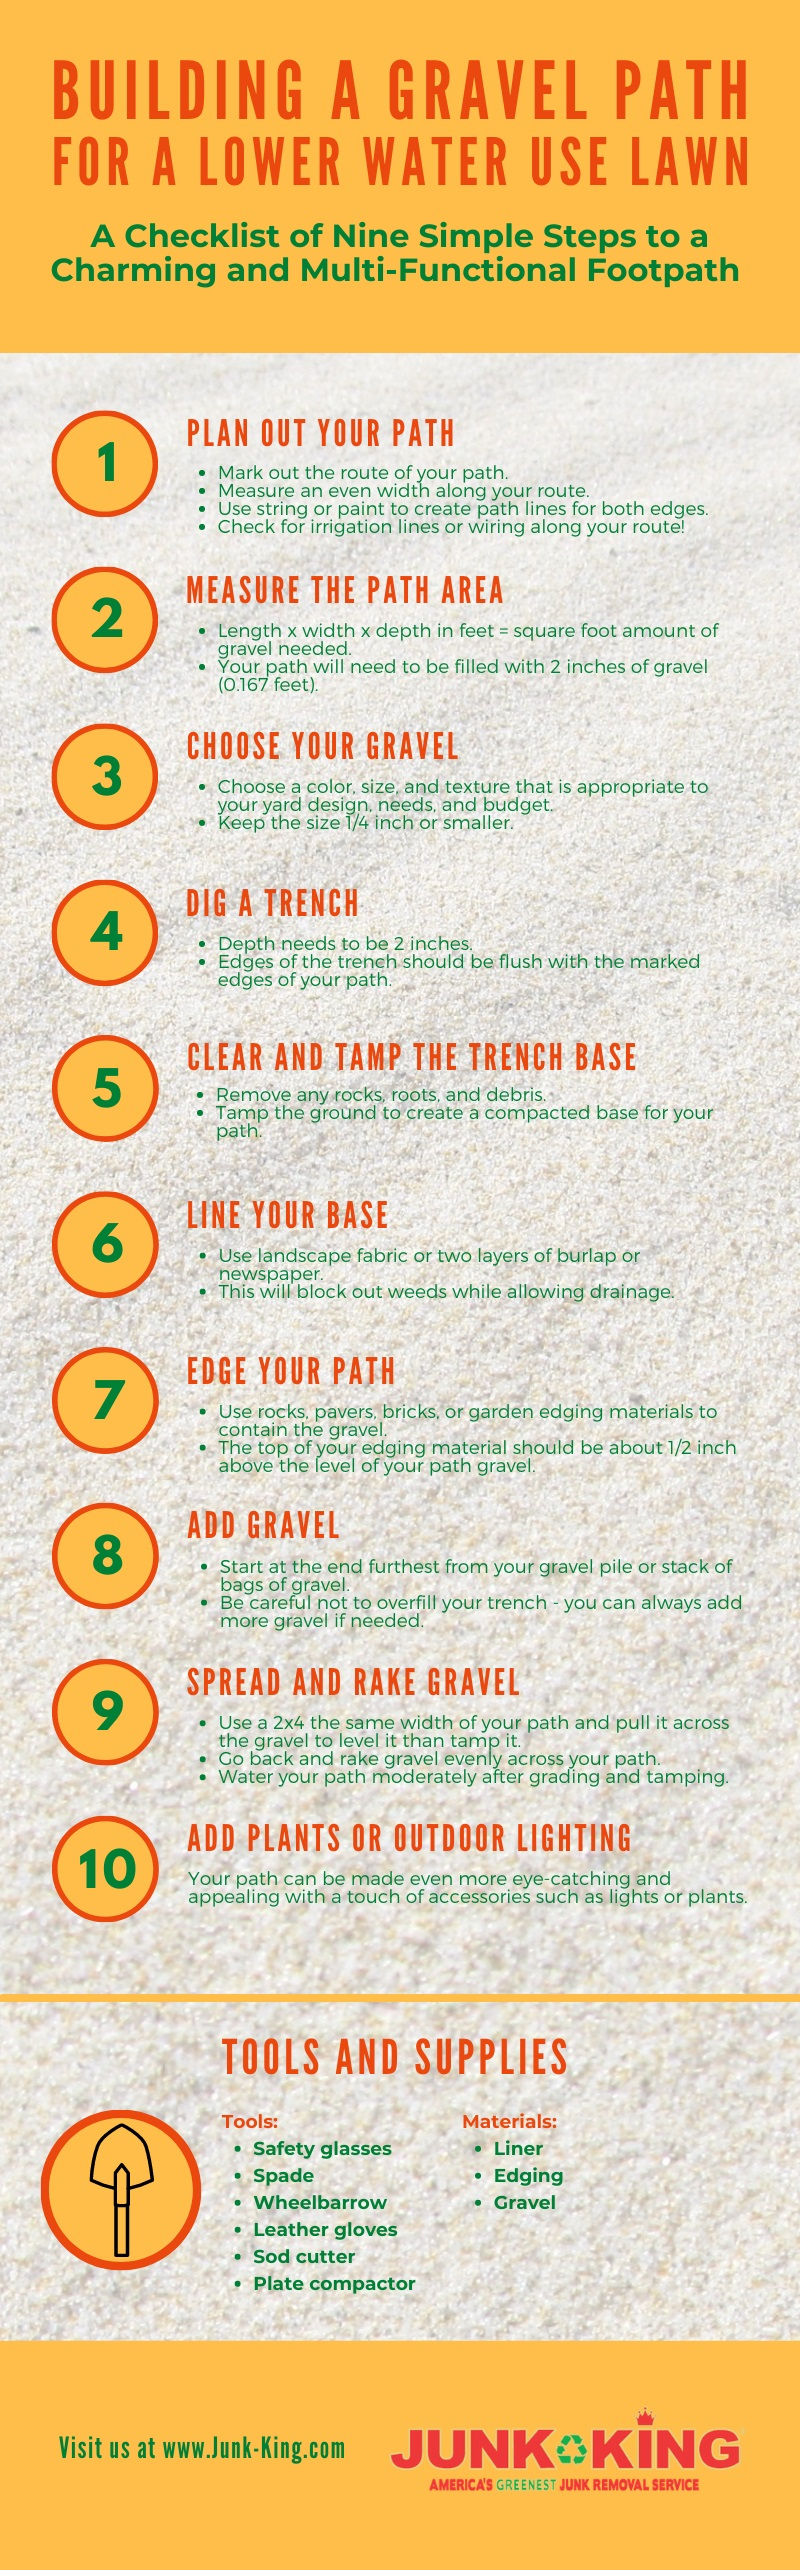 Building a Gravel Path - Checklist